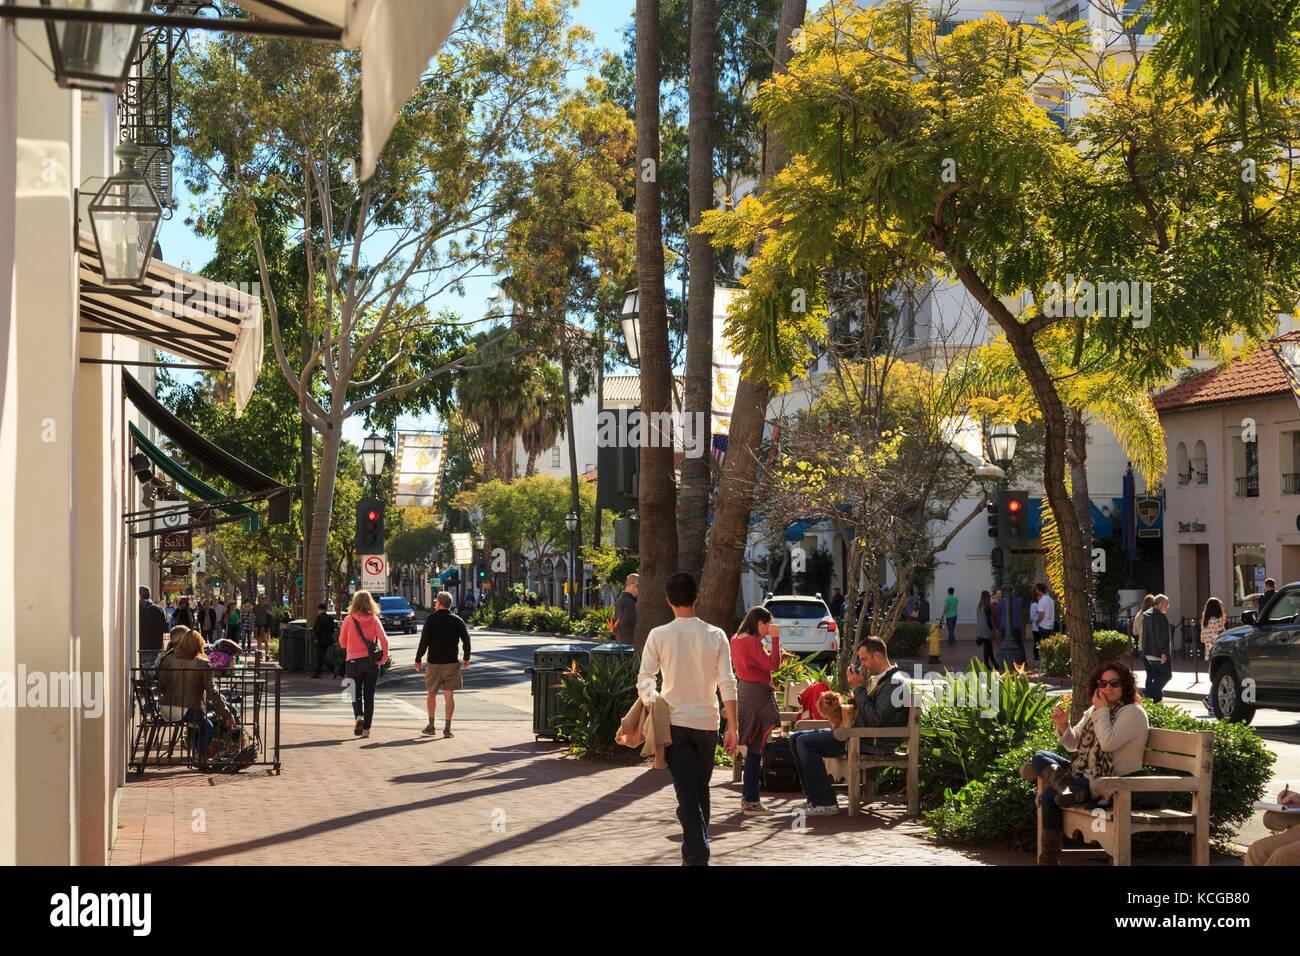 In Santa Barbara, California, United States - photo by